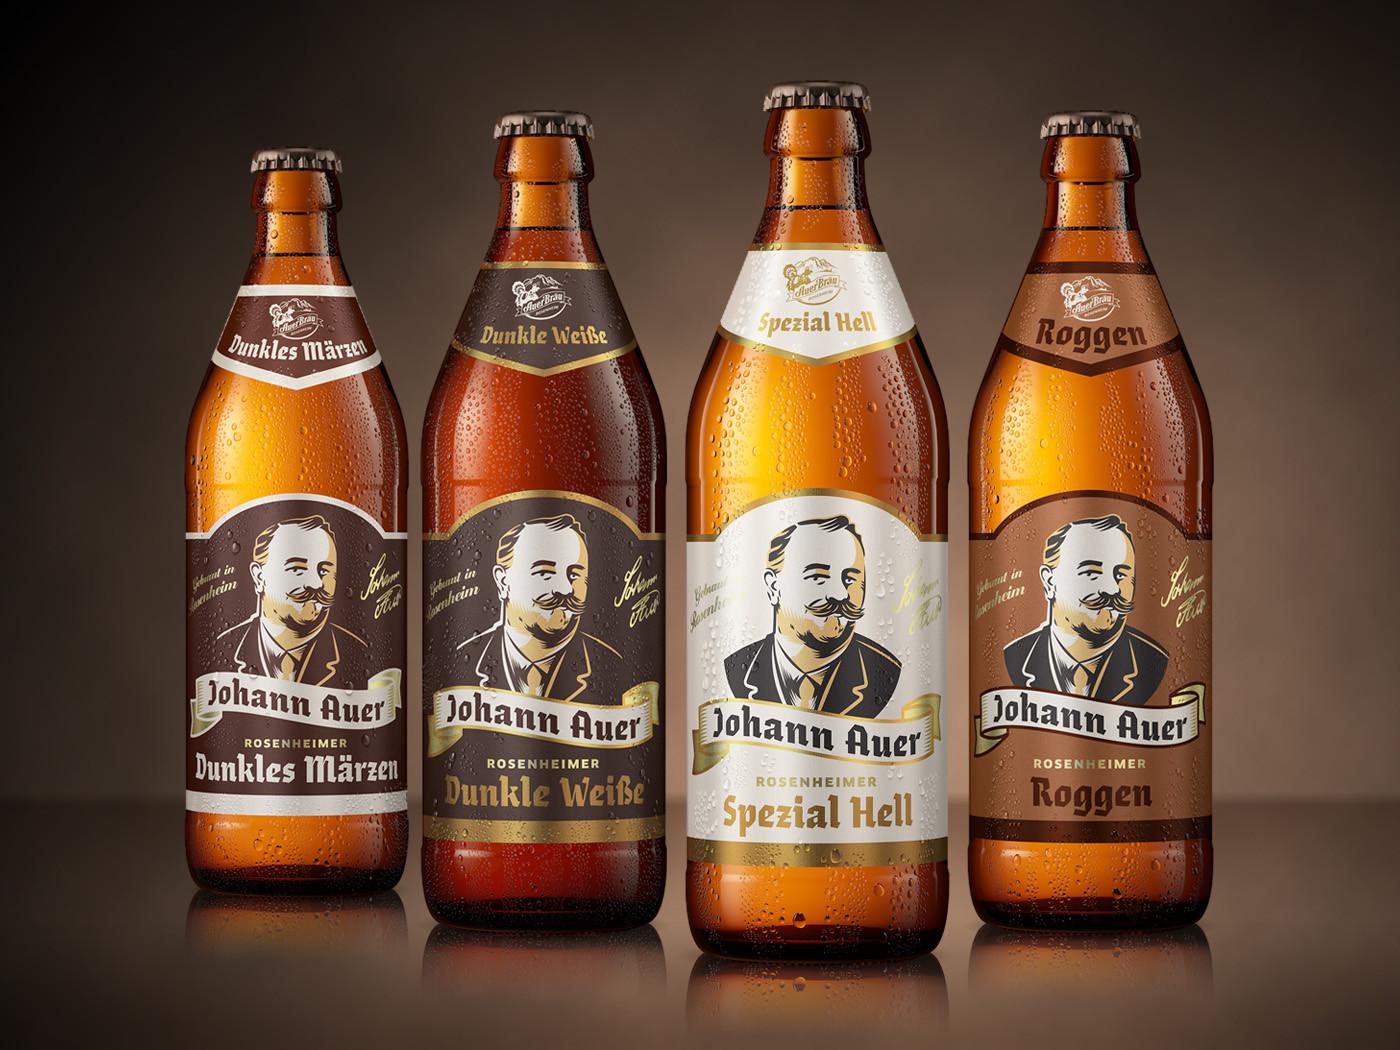 bierflaschen-3d-rendering-cgi-produktabb